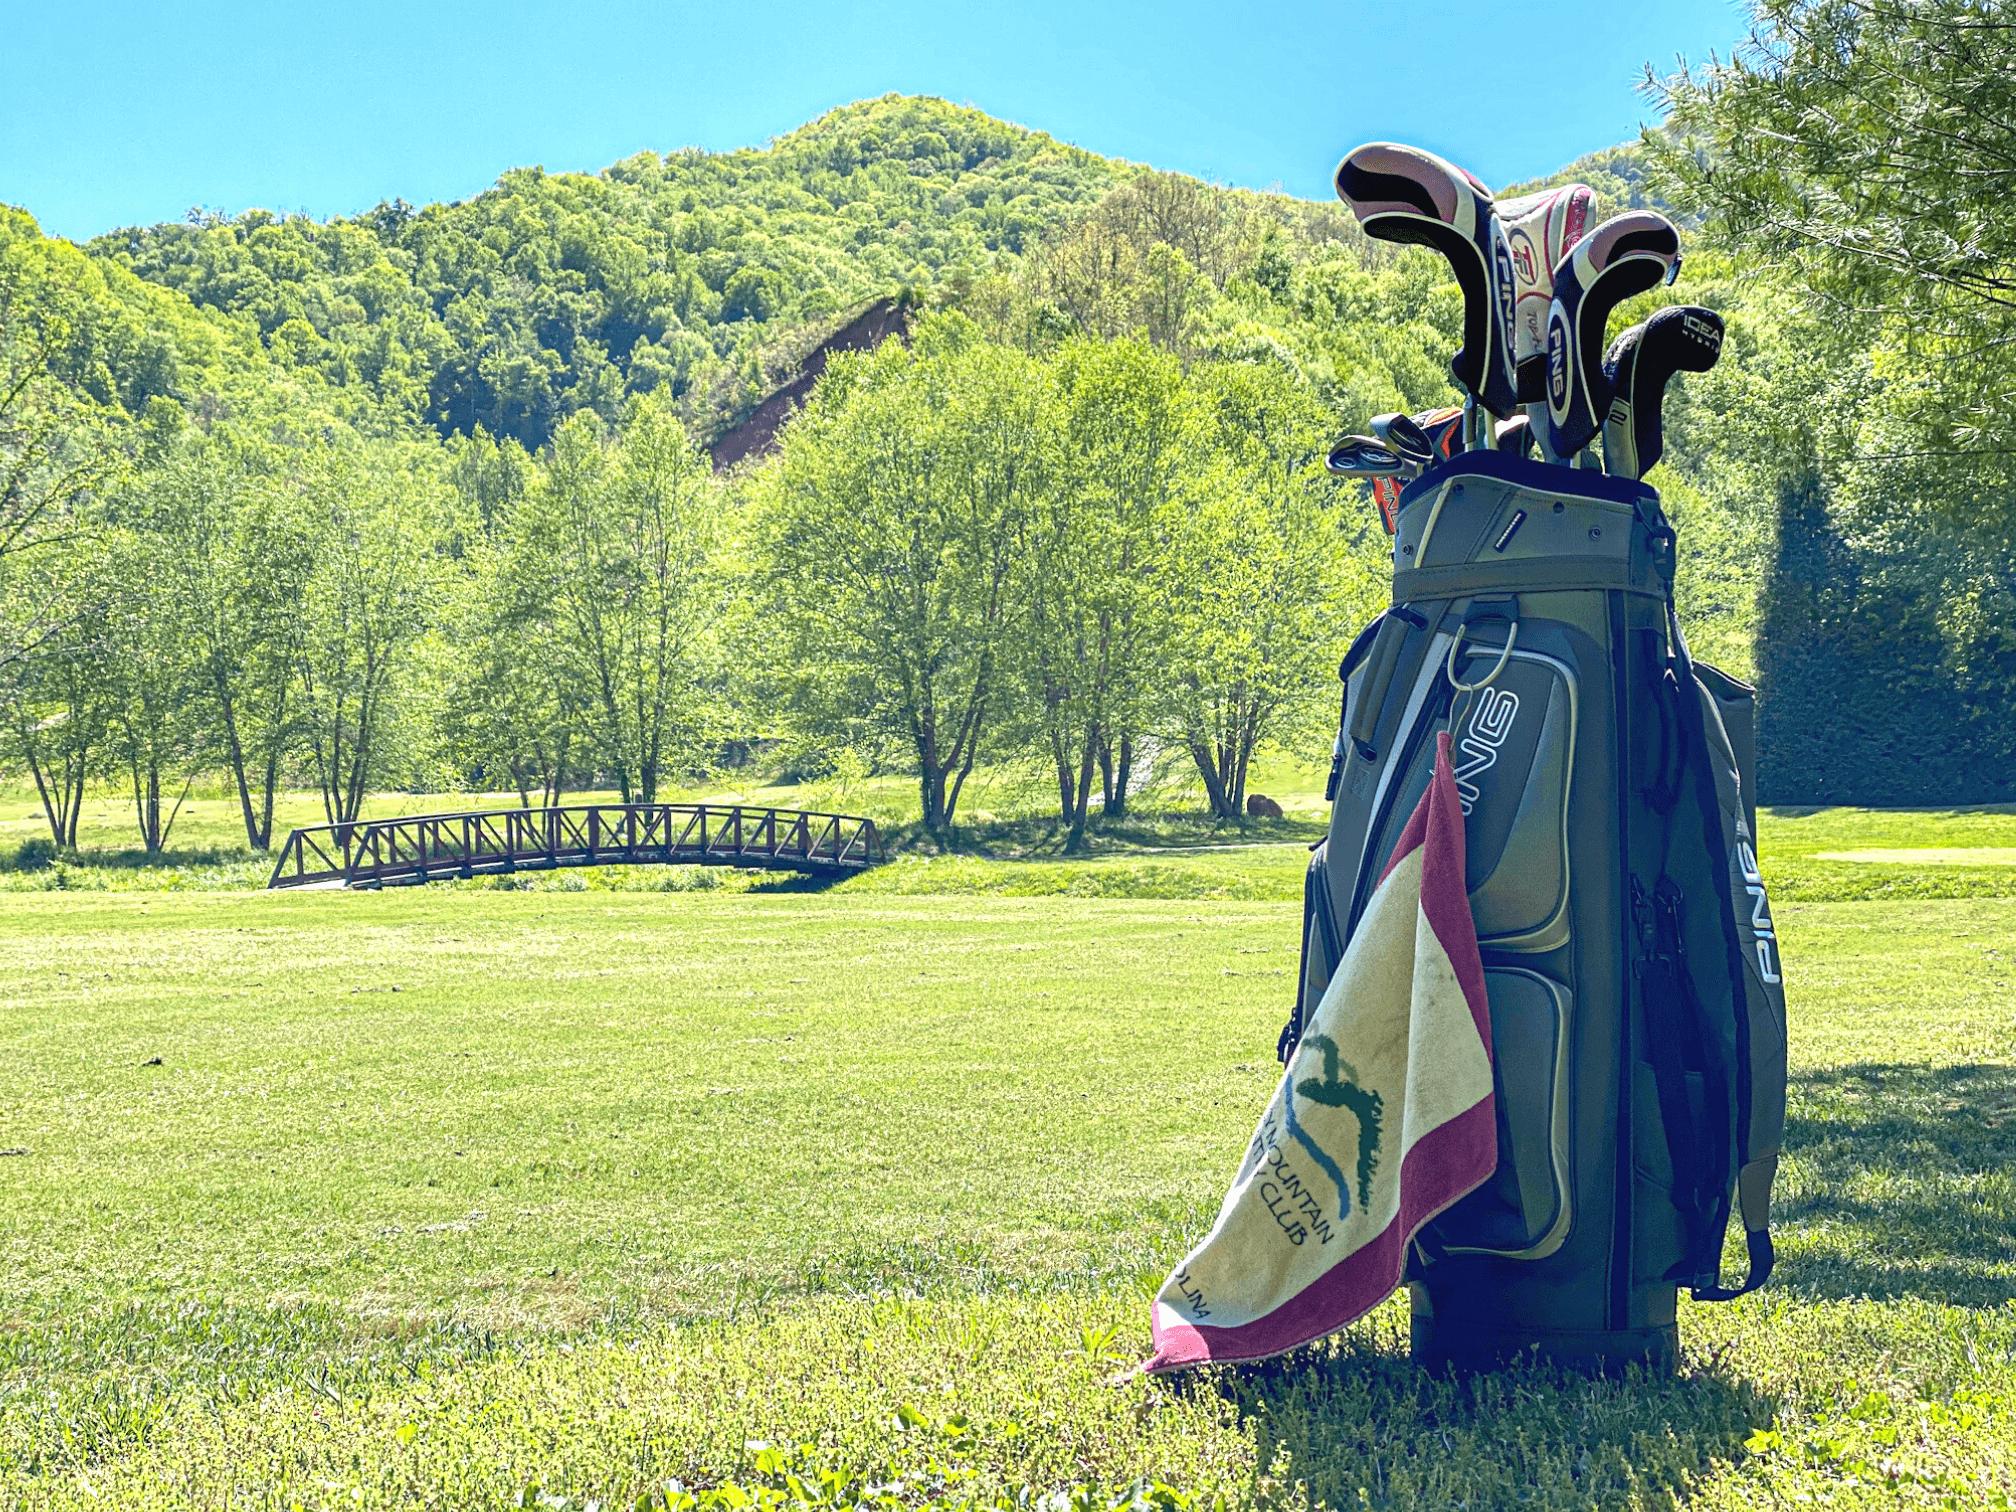 Smoky Mountain Golf